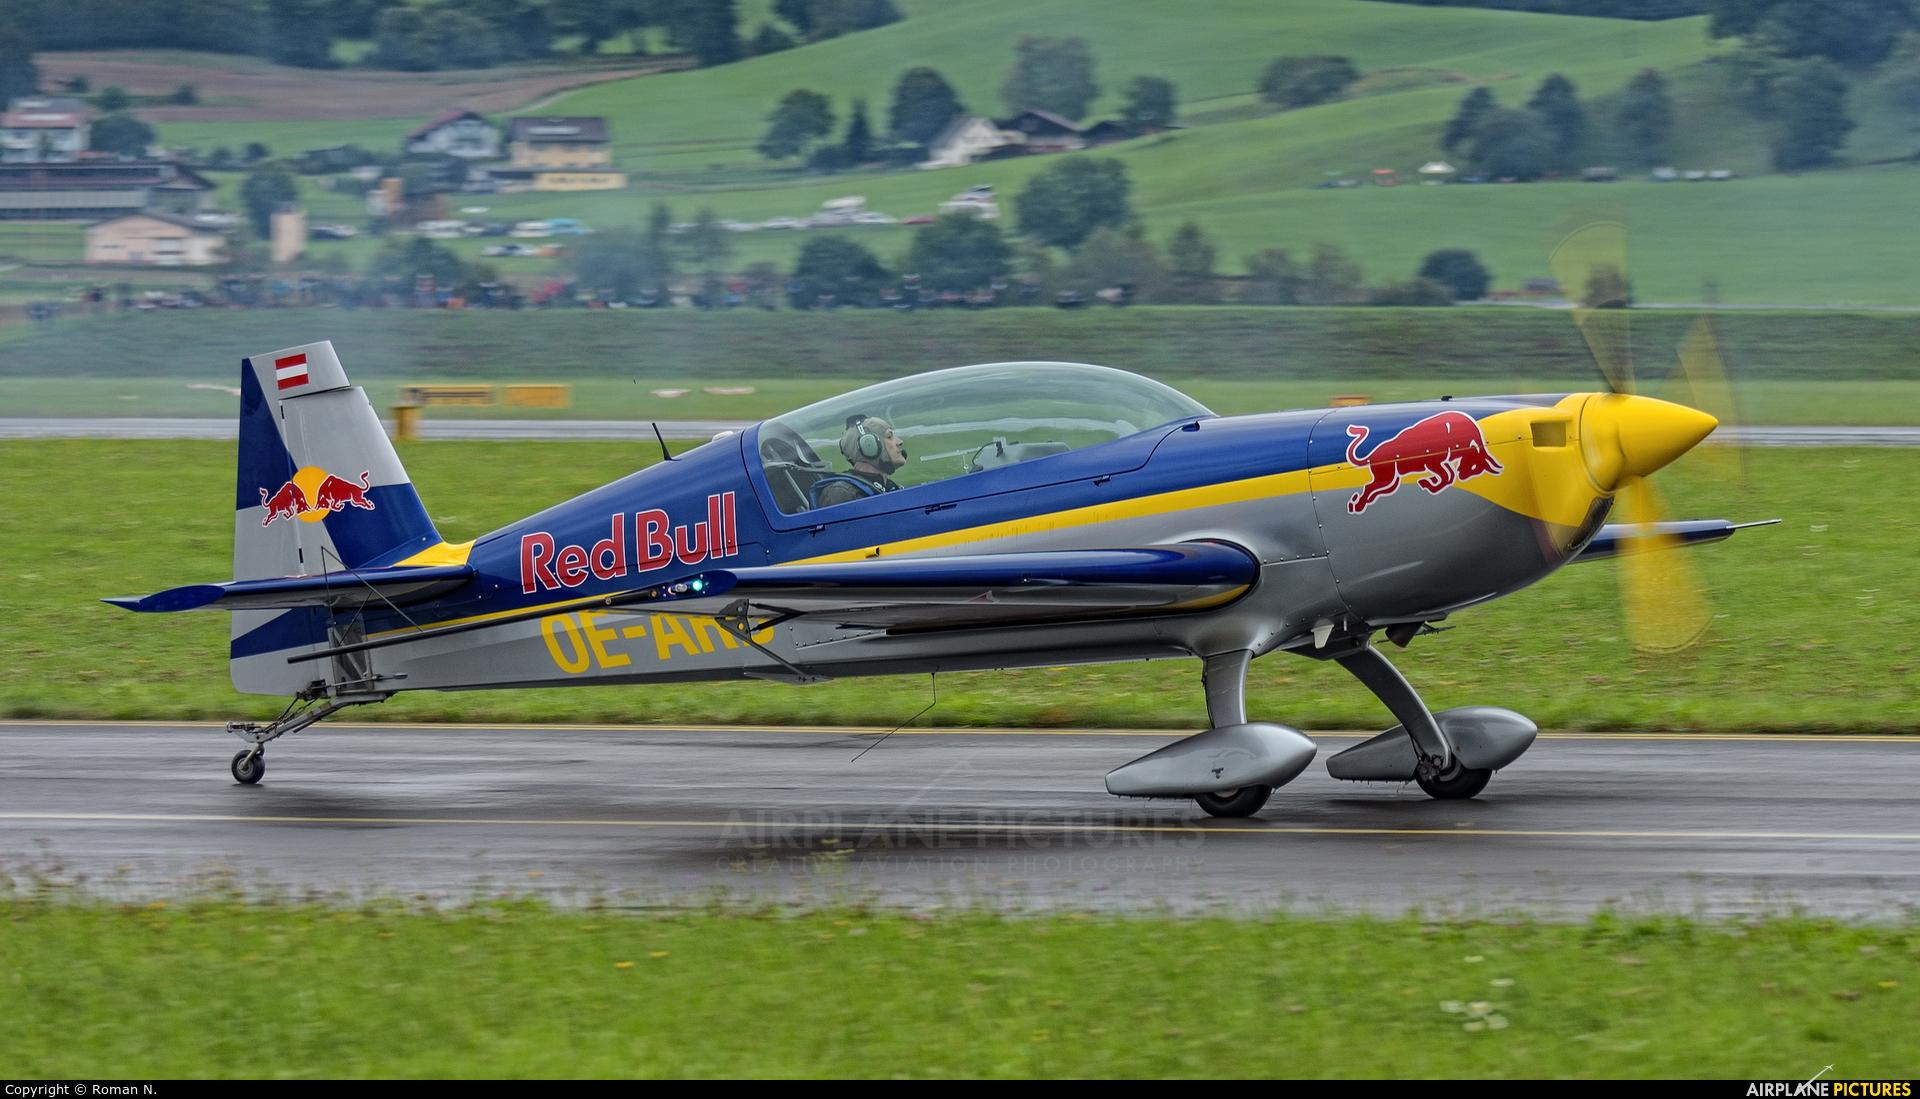 Red Bull OE-ARB aircraft at Zeltweg